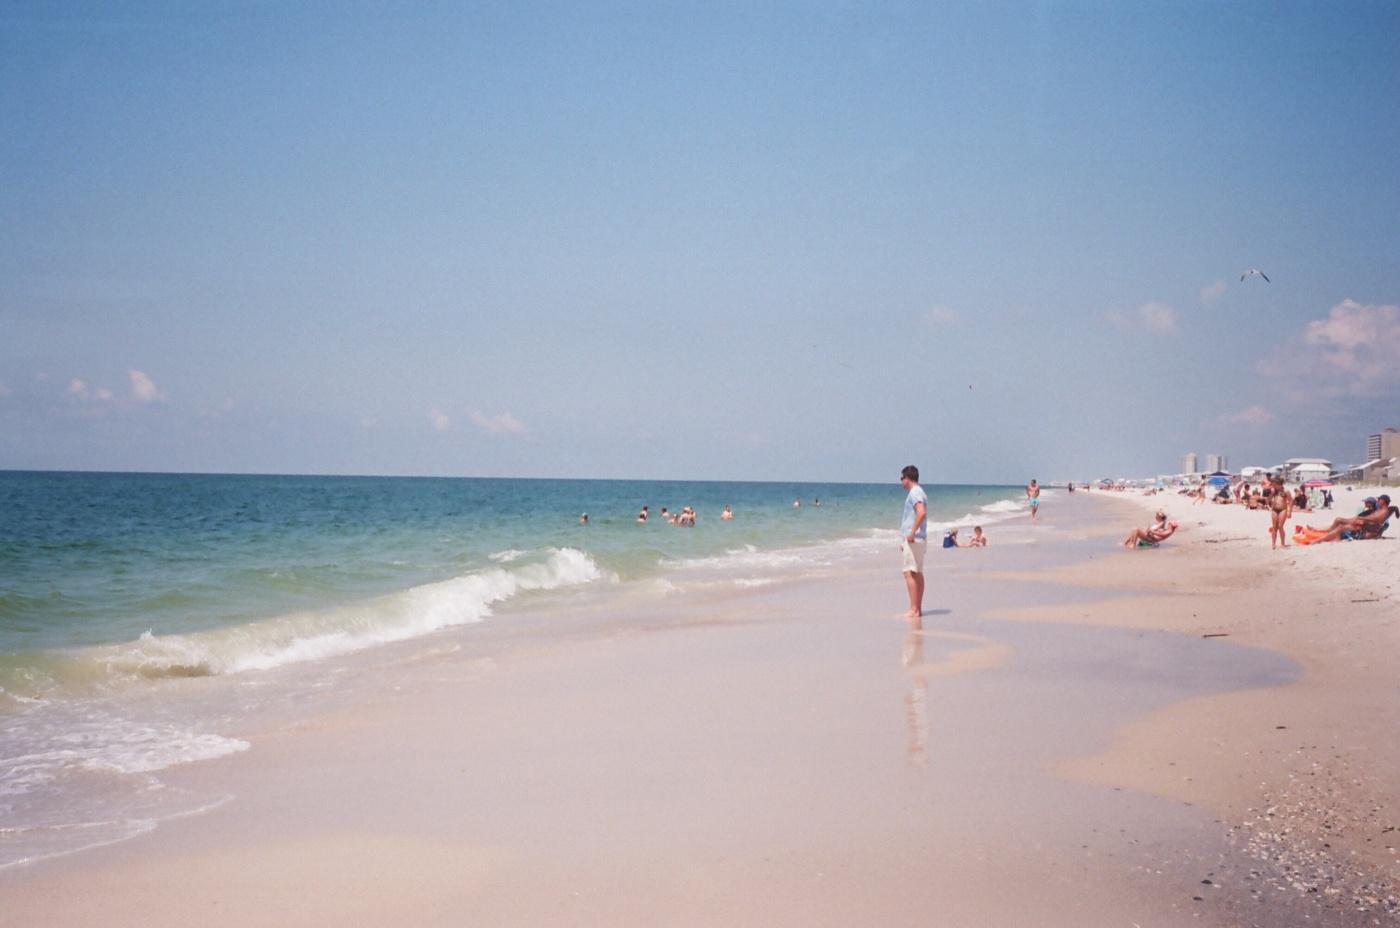 Beach_1.jpeg